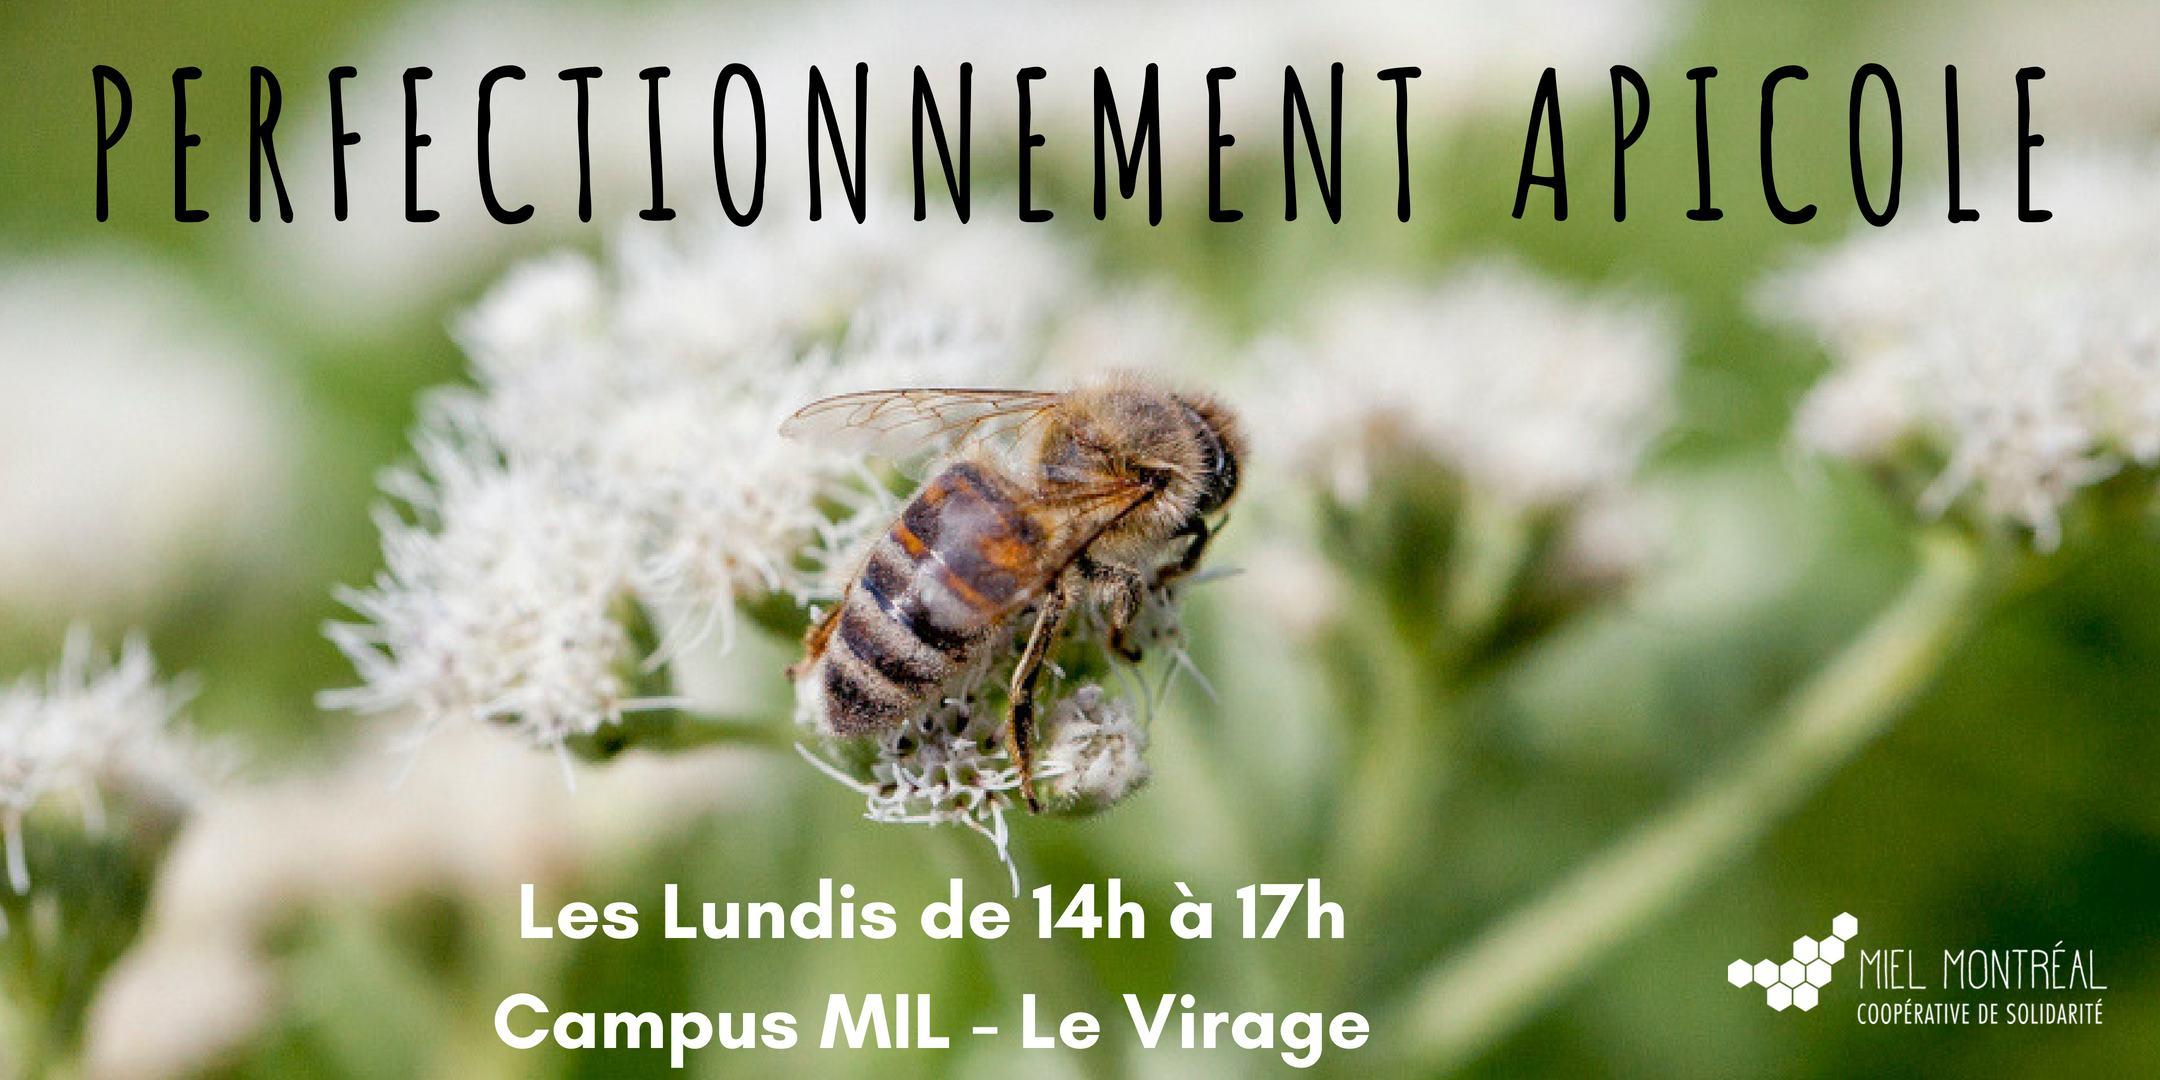 Ateliers, perfectionnement apicole, expertise apiculture, maladies, gestion ruches, formation pratique,